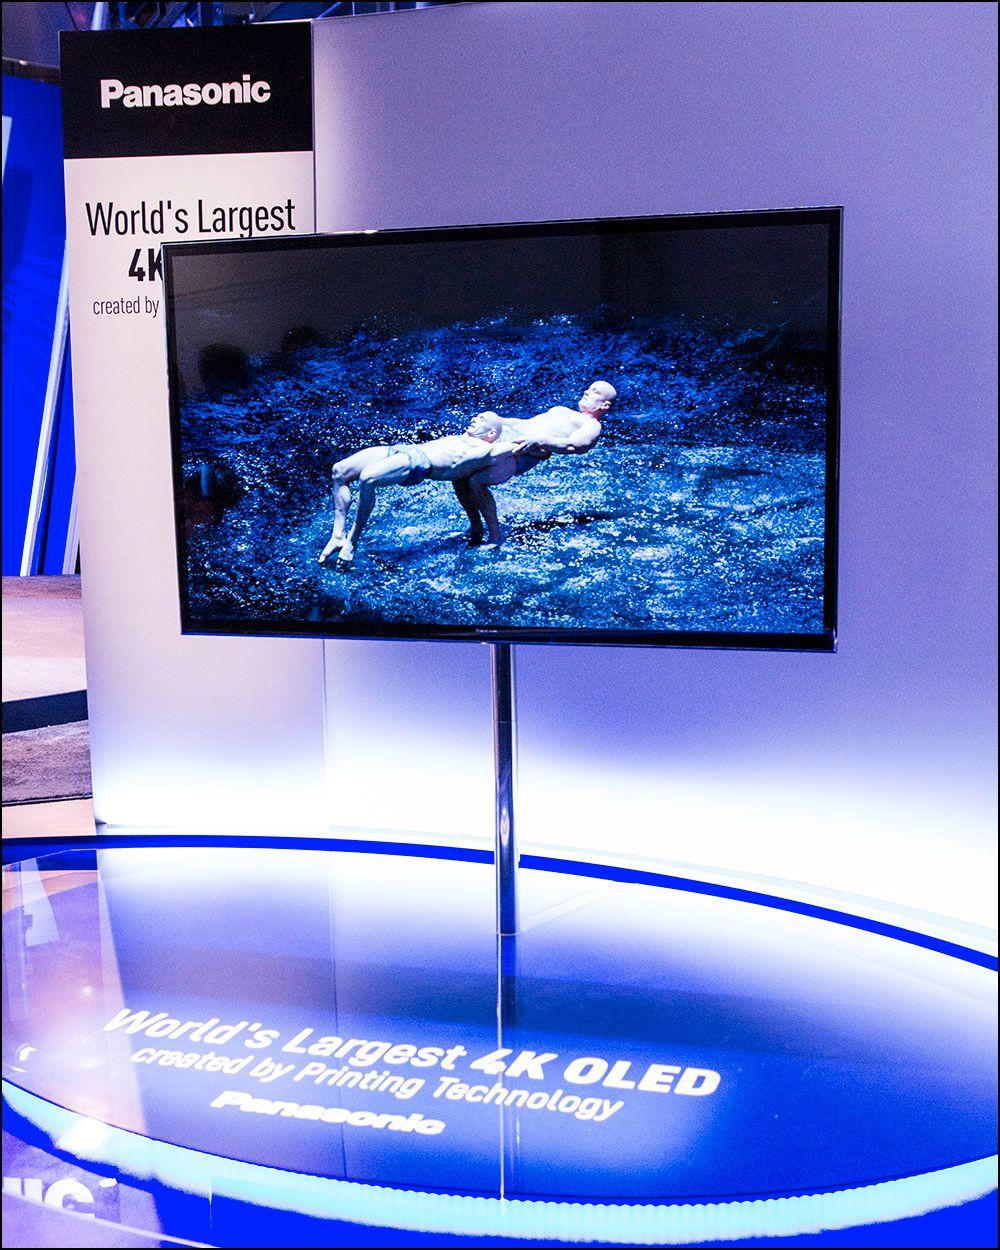 56 tommer, OLED-panel og over åtte millioner piklser. Dette er en rekord.Foto: Niklas Plikk, Hardware.no